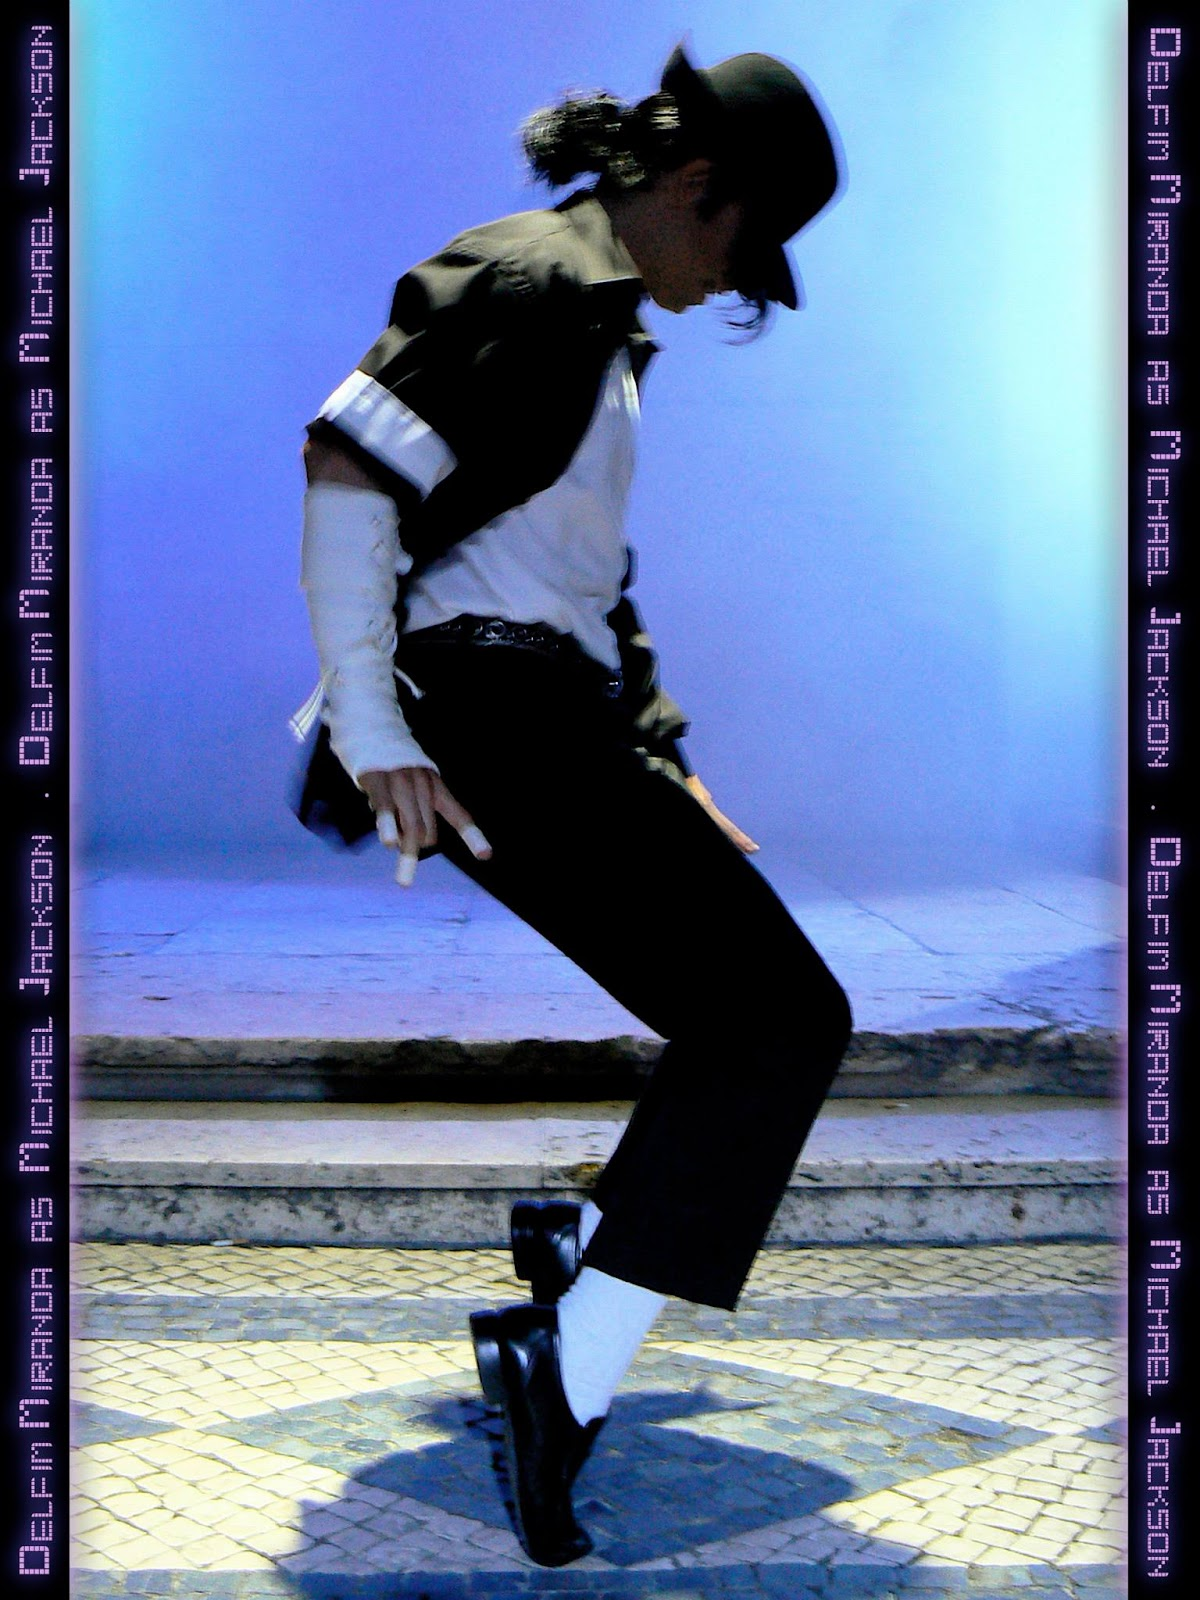 Delfim Miranda - Michael Jackson Tribute - Pose for TV commercial - Imagens de Marca